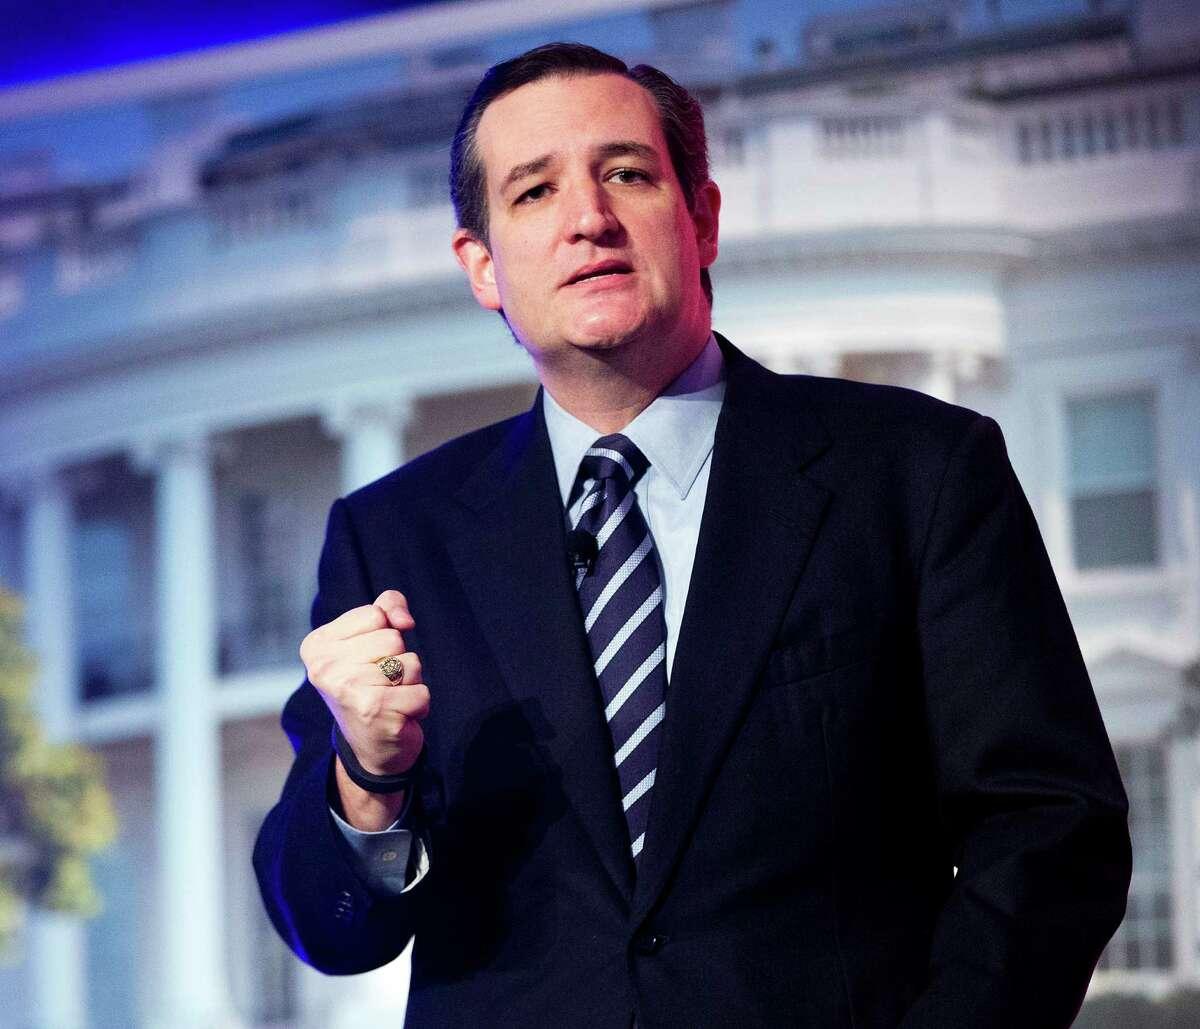 Sen. Ted Cruz is ready to run.